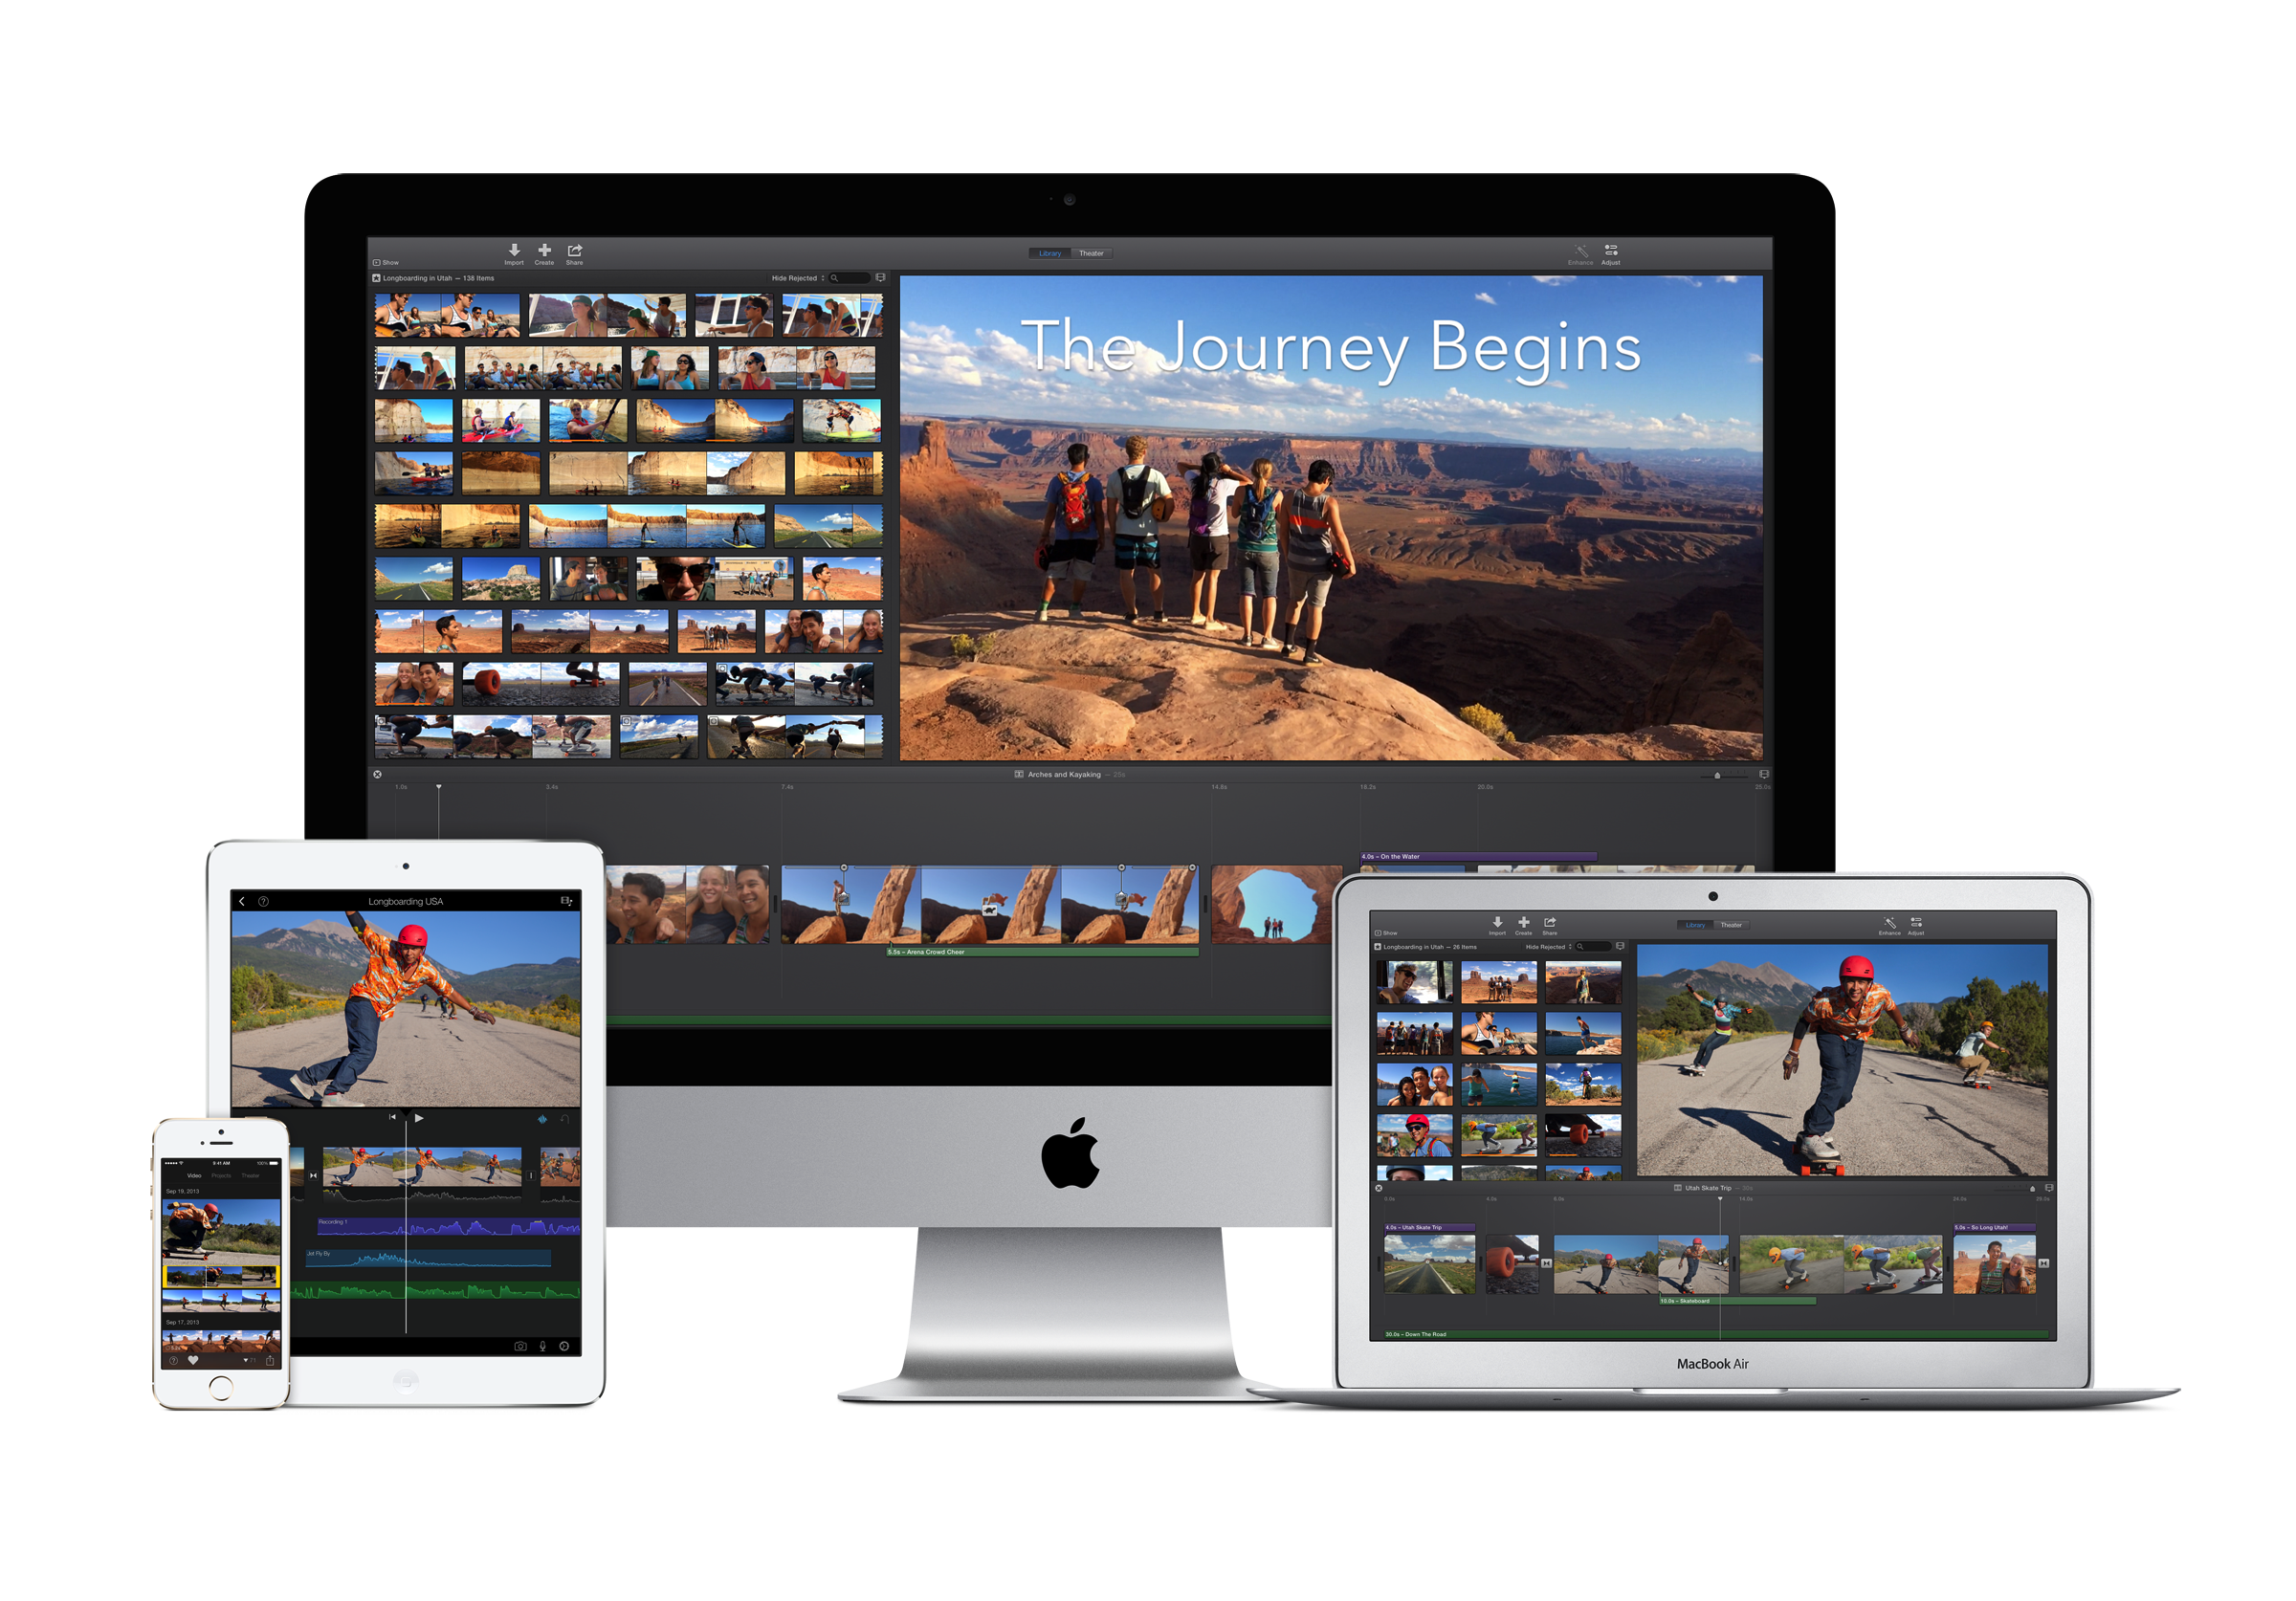 【Sale情報/ Mac】スクリーンレコーダー「Screen Recorder HD Pro」が3日間の期間限定で無料